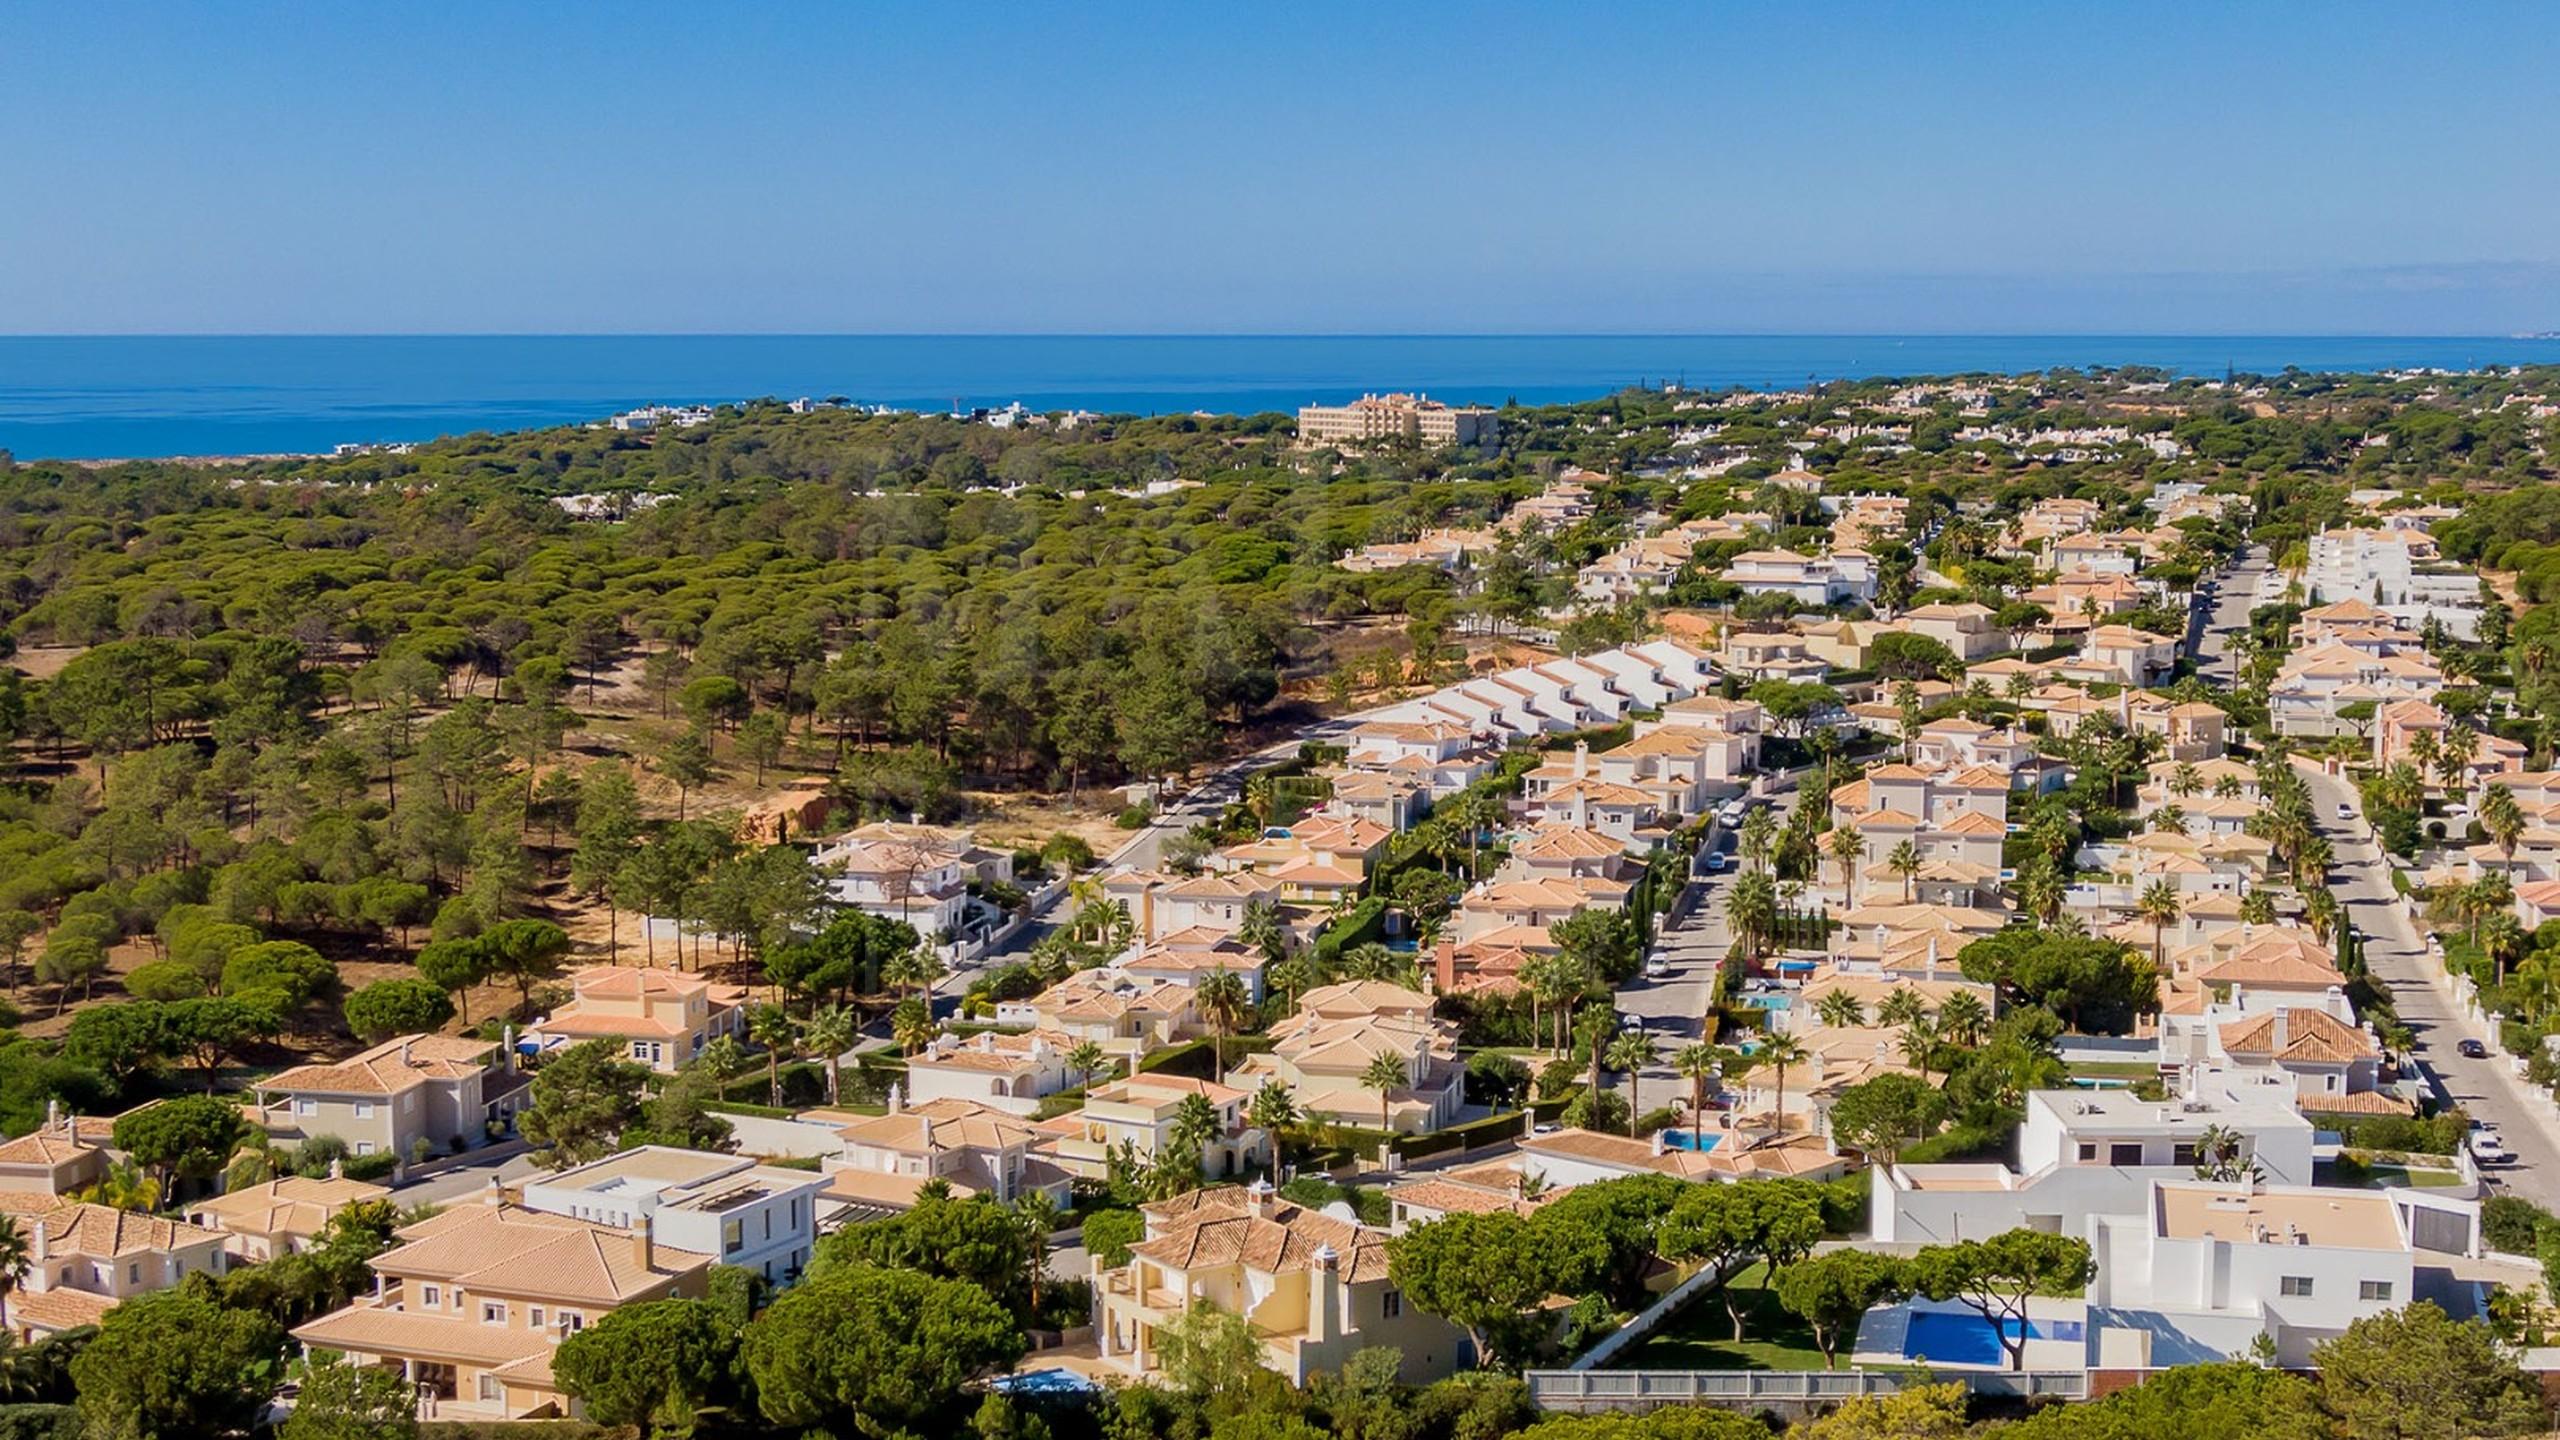 Land for sale near the beach in Algarve